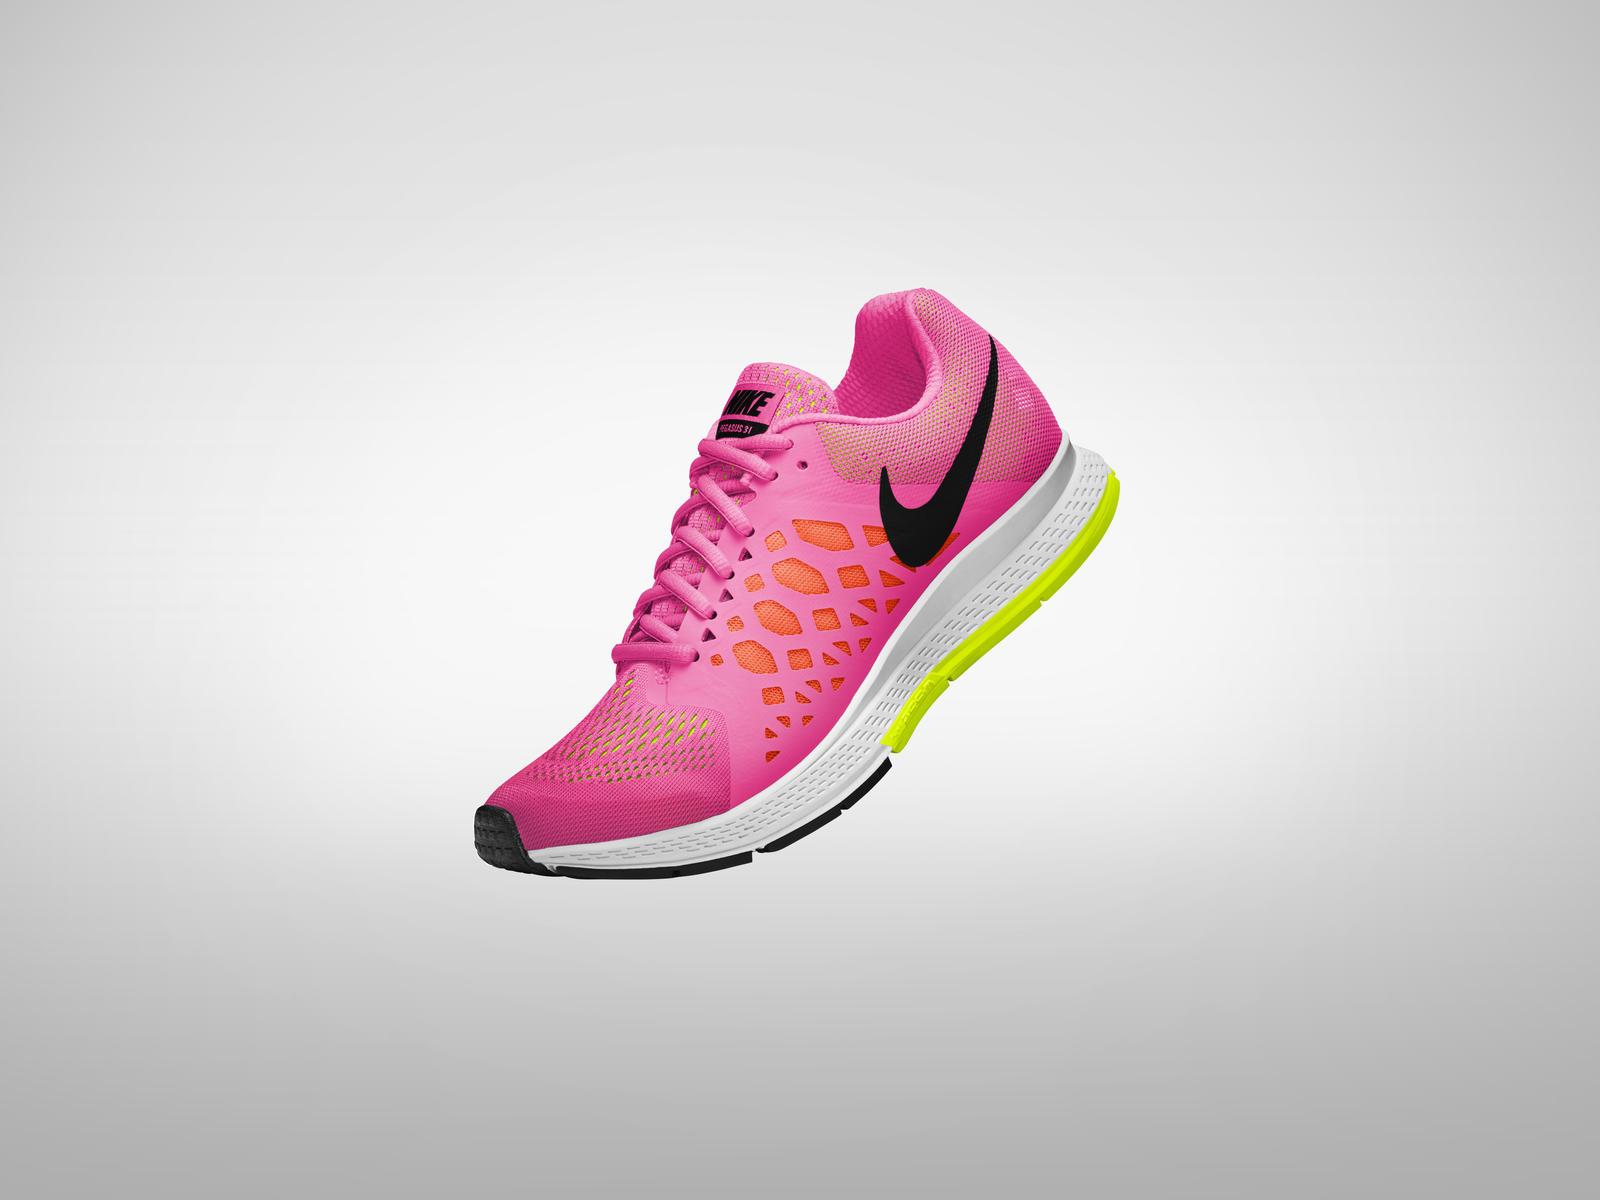 brand new 86646 1d6b2 Mobile Gallery Image ... Nike Pegasus 31 side mens nike zoom pegasus 31  yellow grey Nike Pegasus 31 ...